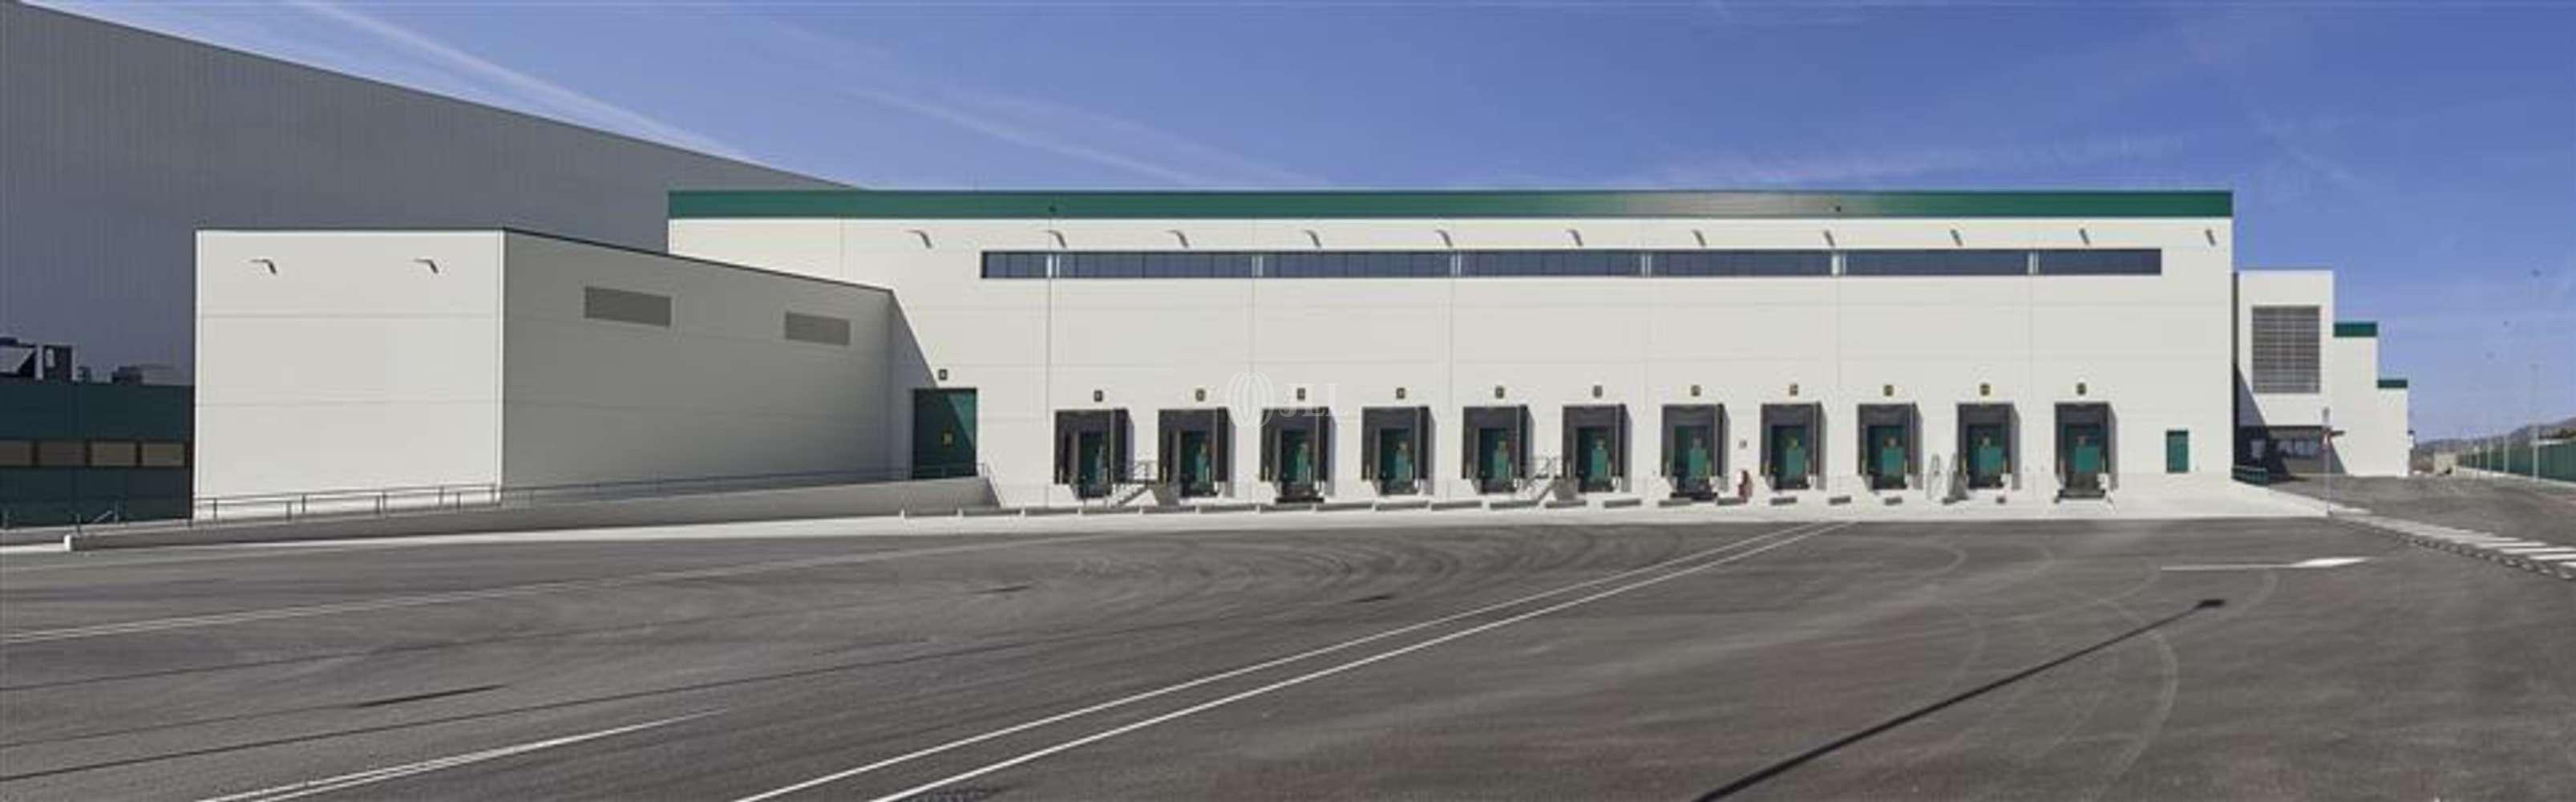 Naves industriales y logísticas La bisbal del penedès, 43717 - Nave Logistica - B0376 - PI LES PLANES - 10539